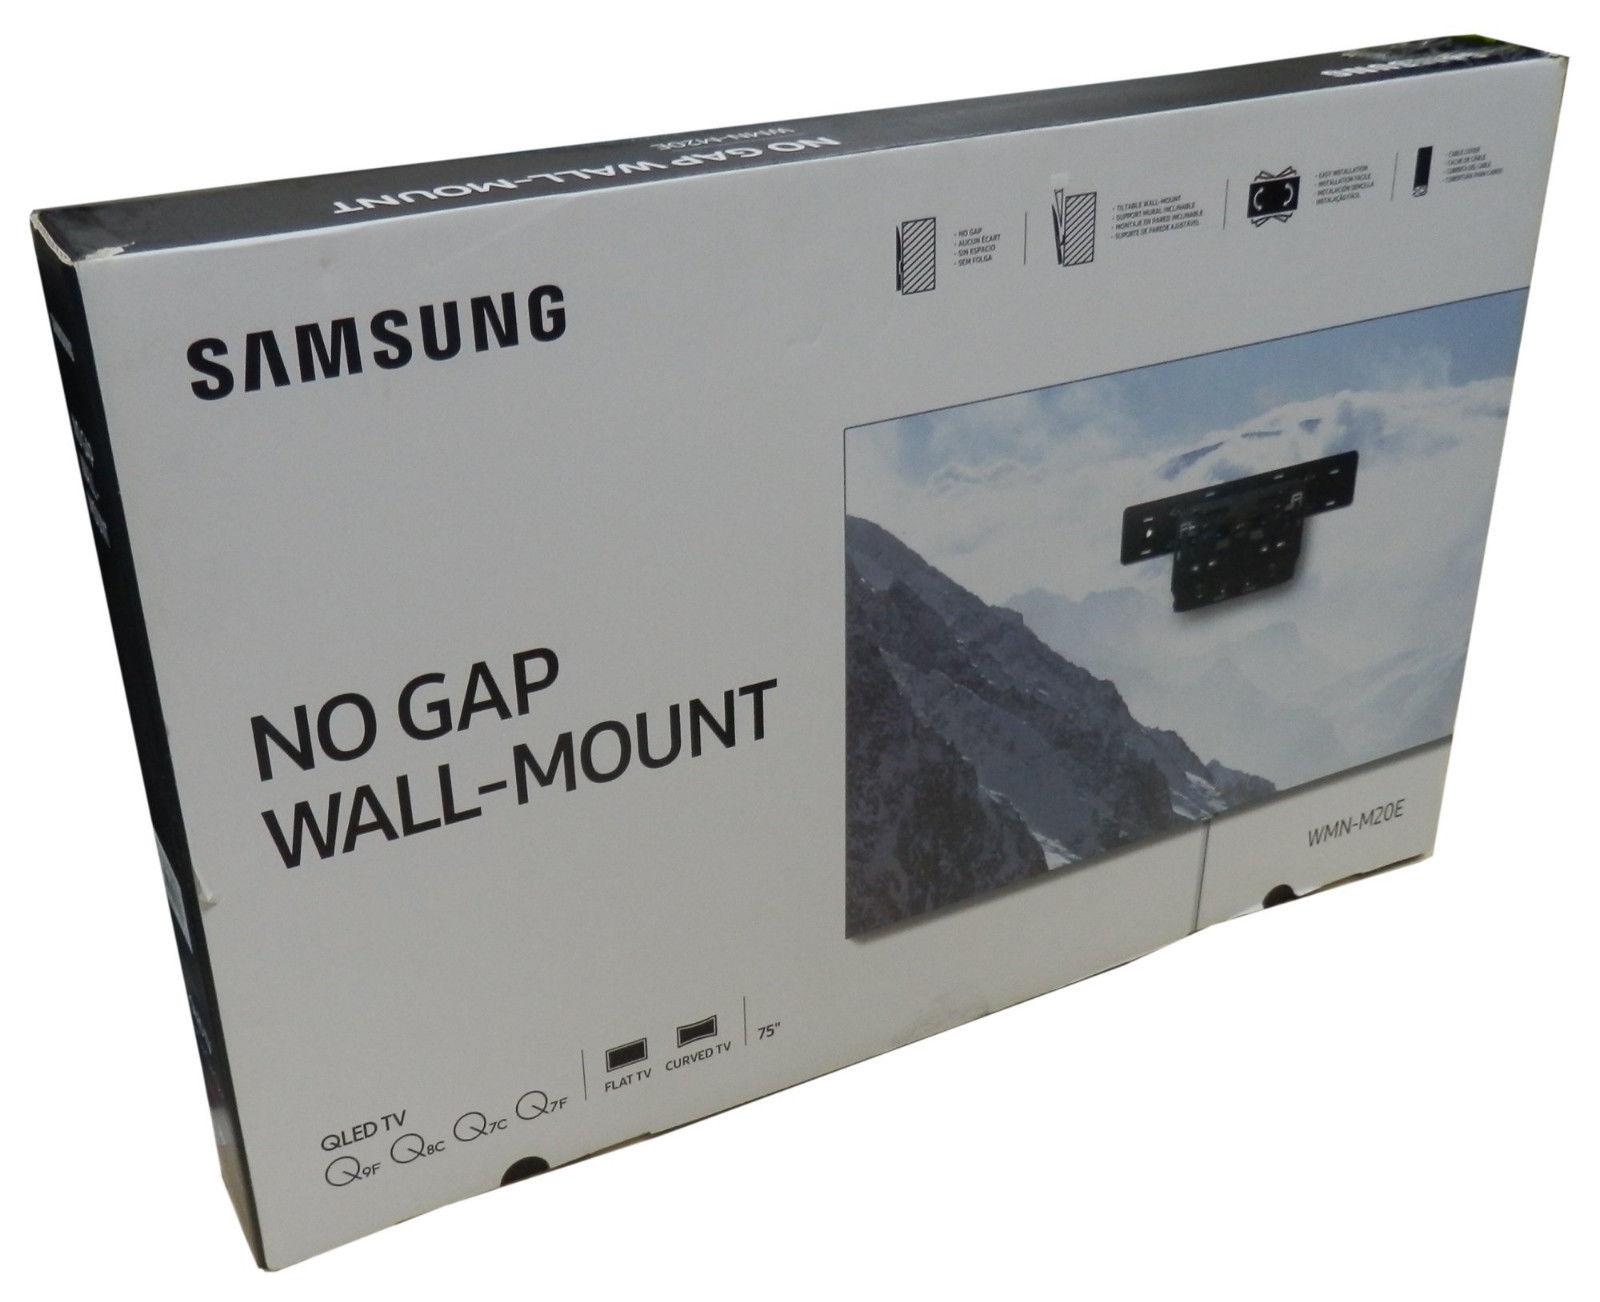 "Amazon - Samsung QLED TV No Gap Wall Mount 45"" to 69""  $114.44 plus tax"